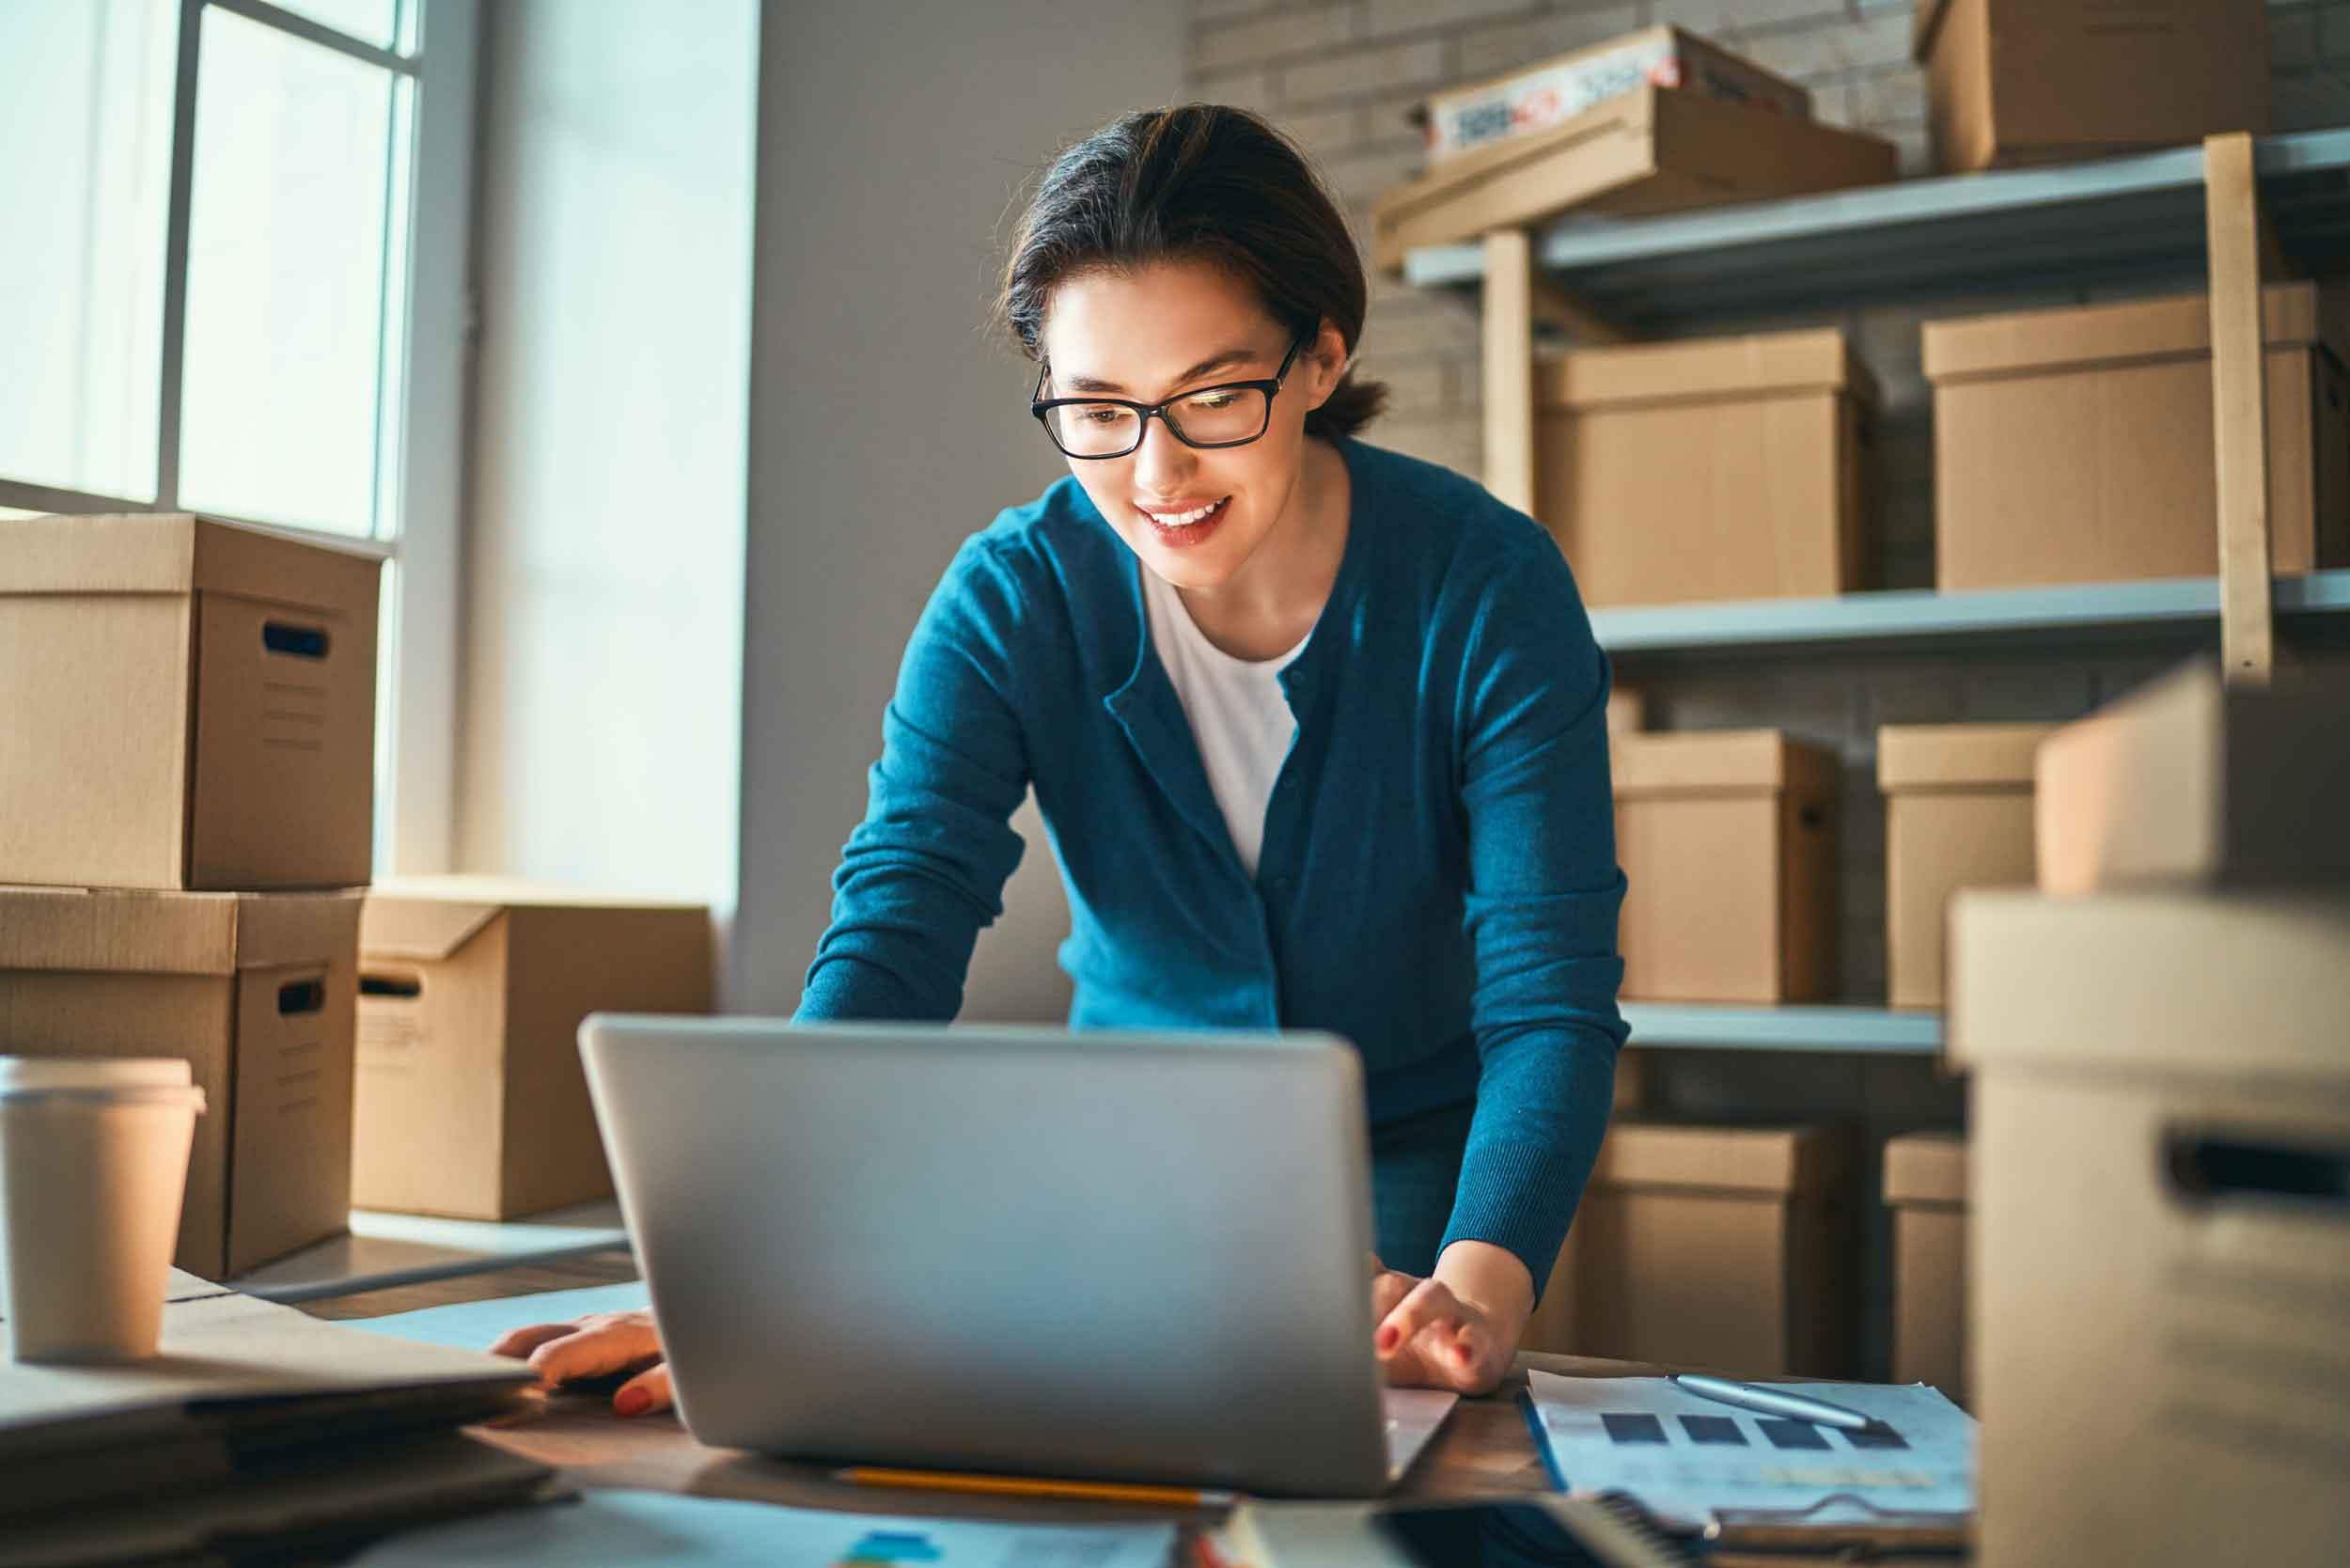 Small Business e-commerce website